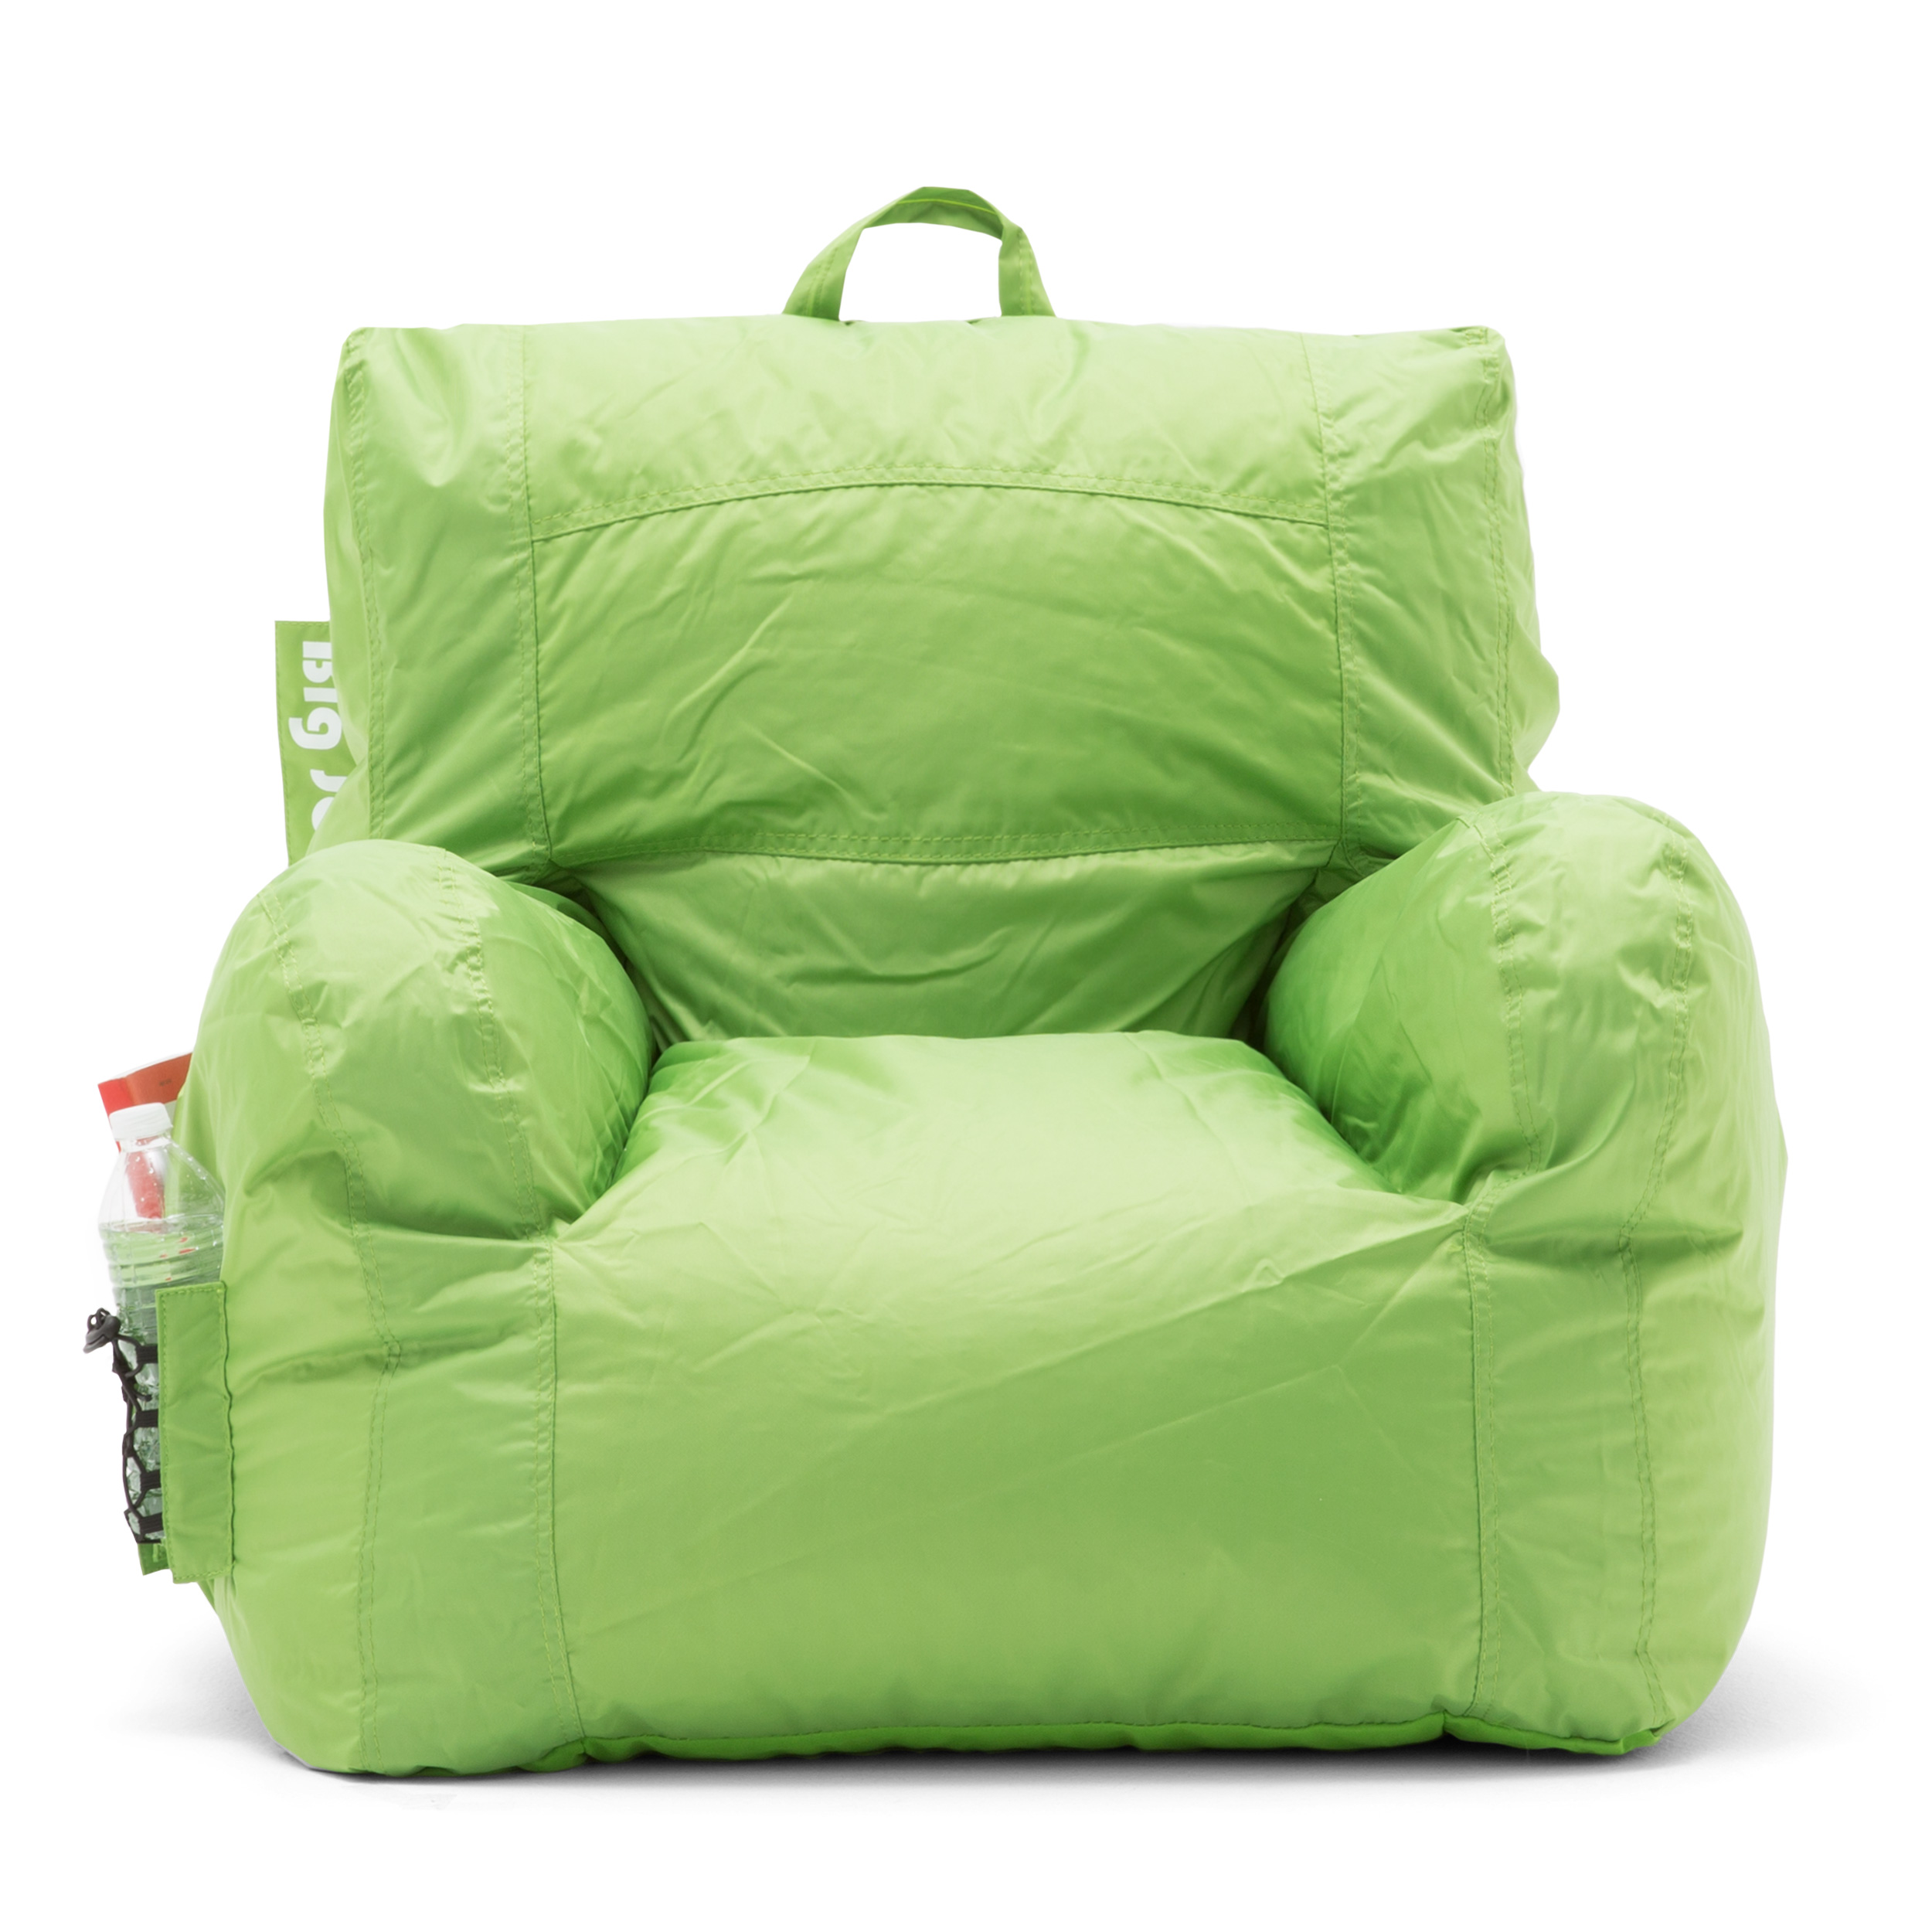 af16546c60e Big Joe Bean Bag Chair, Multiple Colors - 33